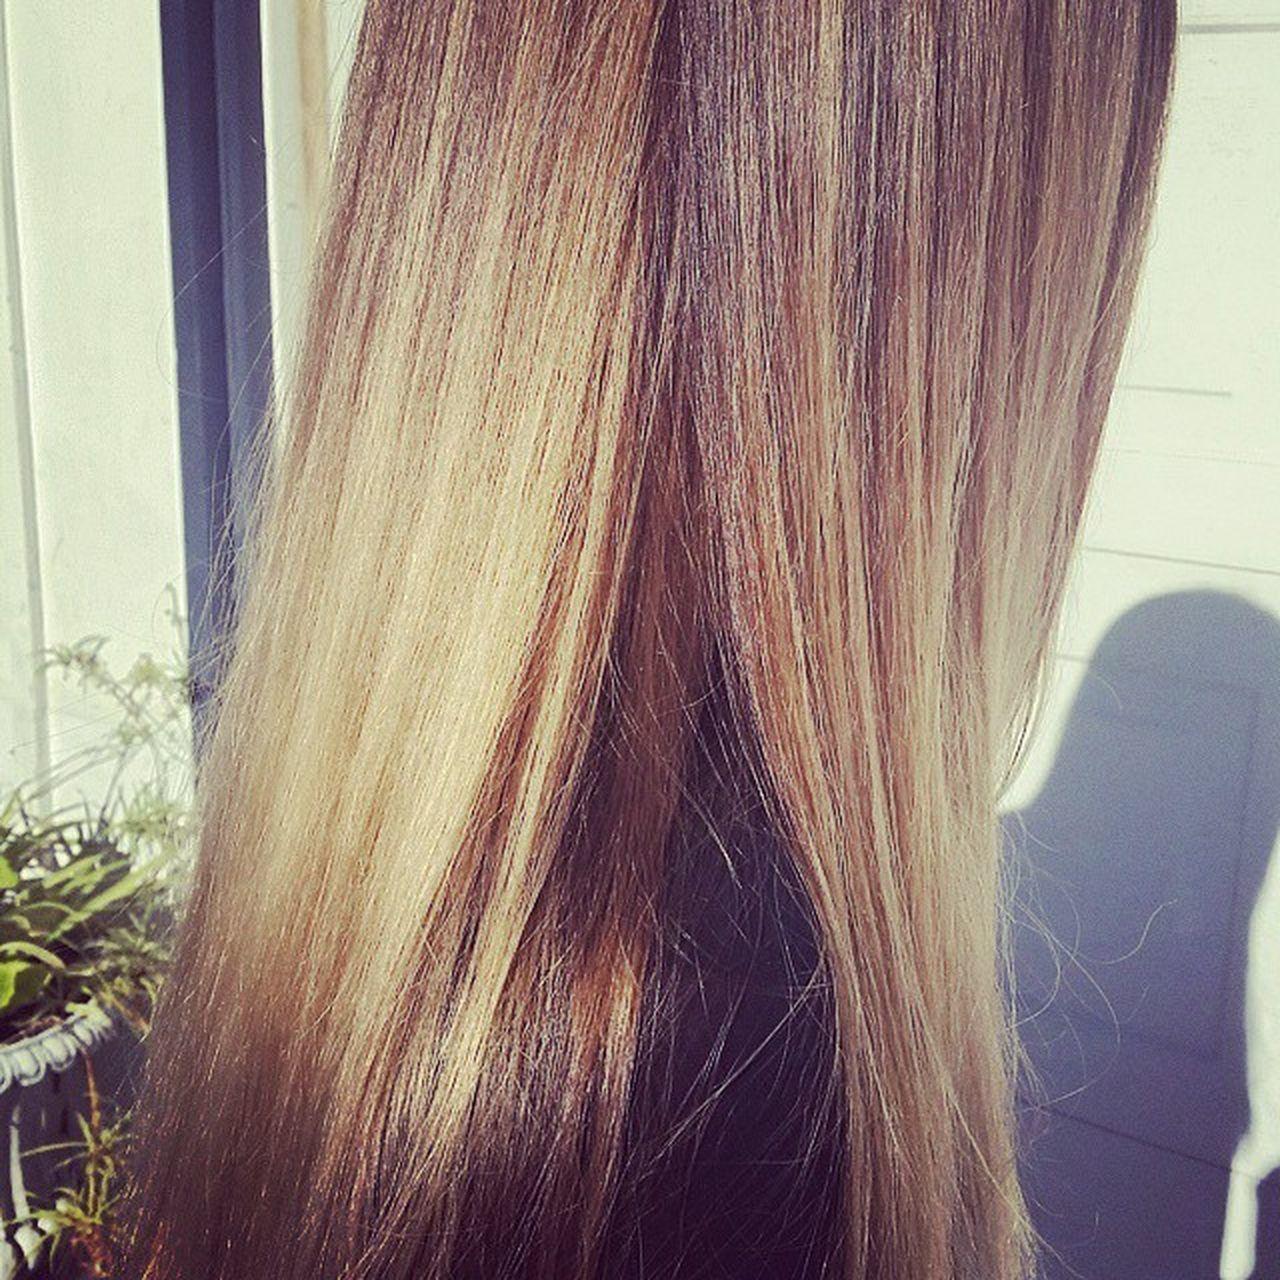 Ecaillehaircolor beautiful natural color. Blondehairdontcare Blonde